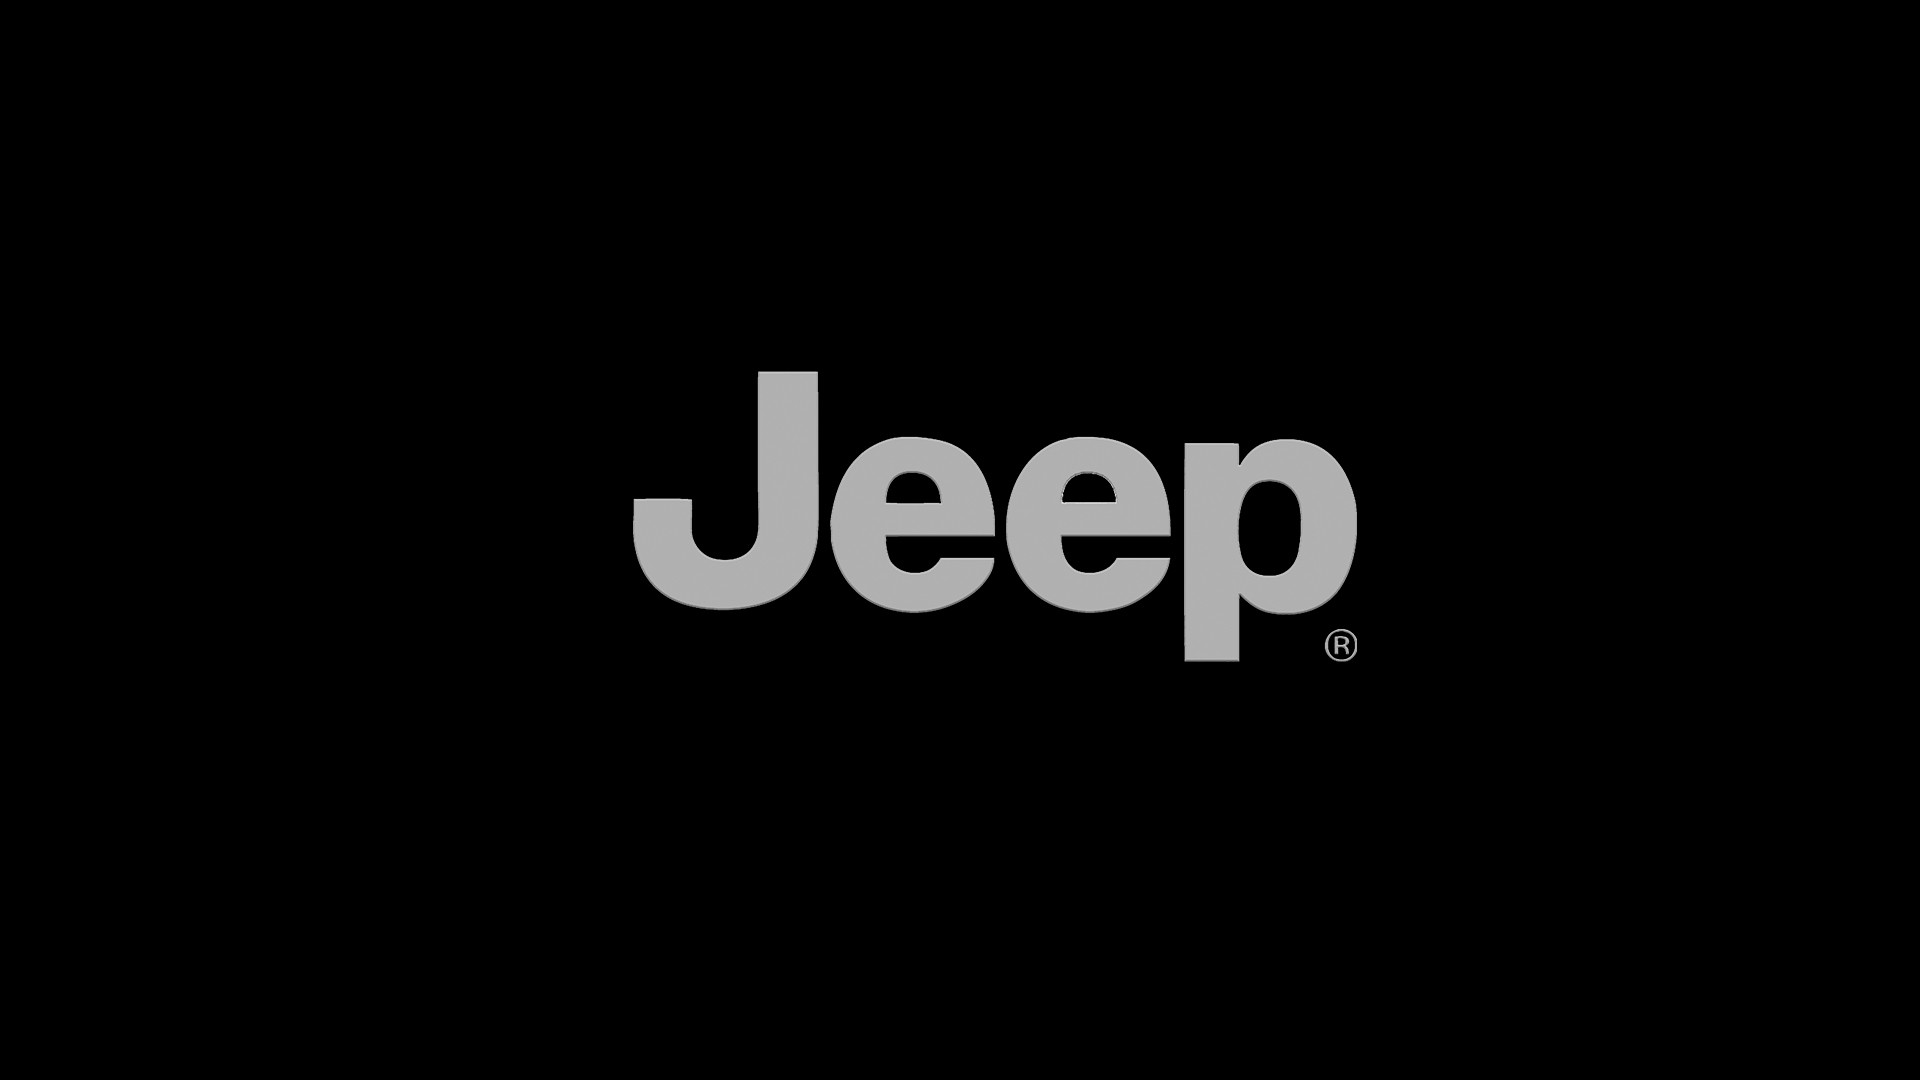 Jeep Logo Iphone 5 Wallpaper | www.galleryhip.com – The .